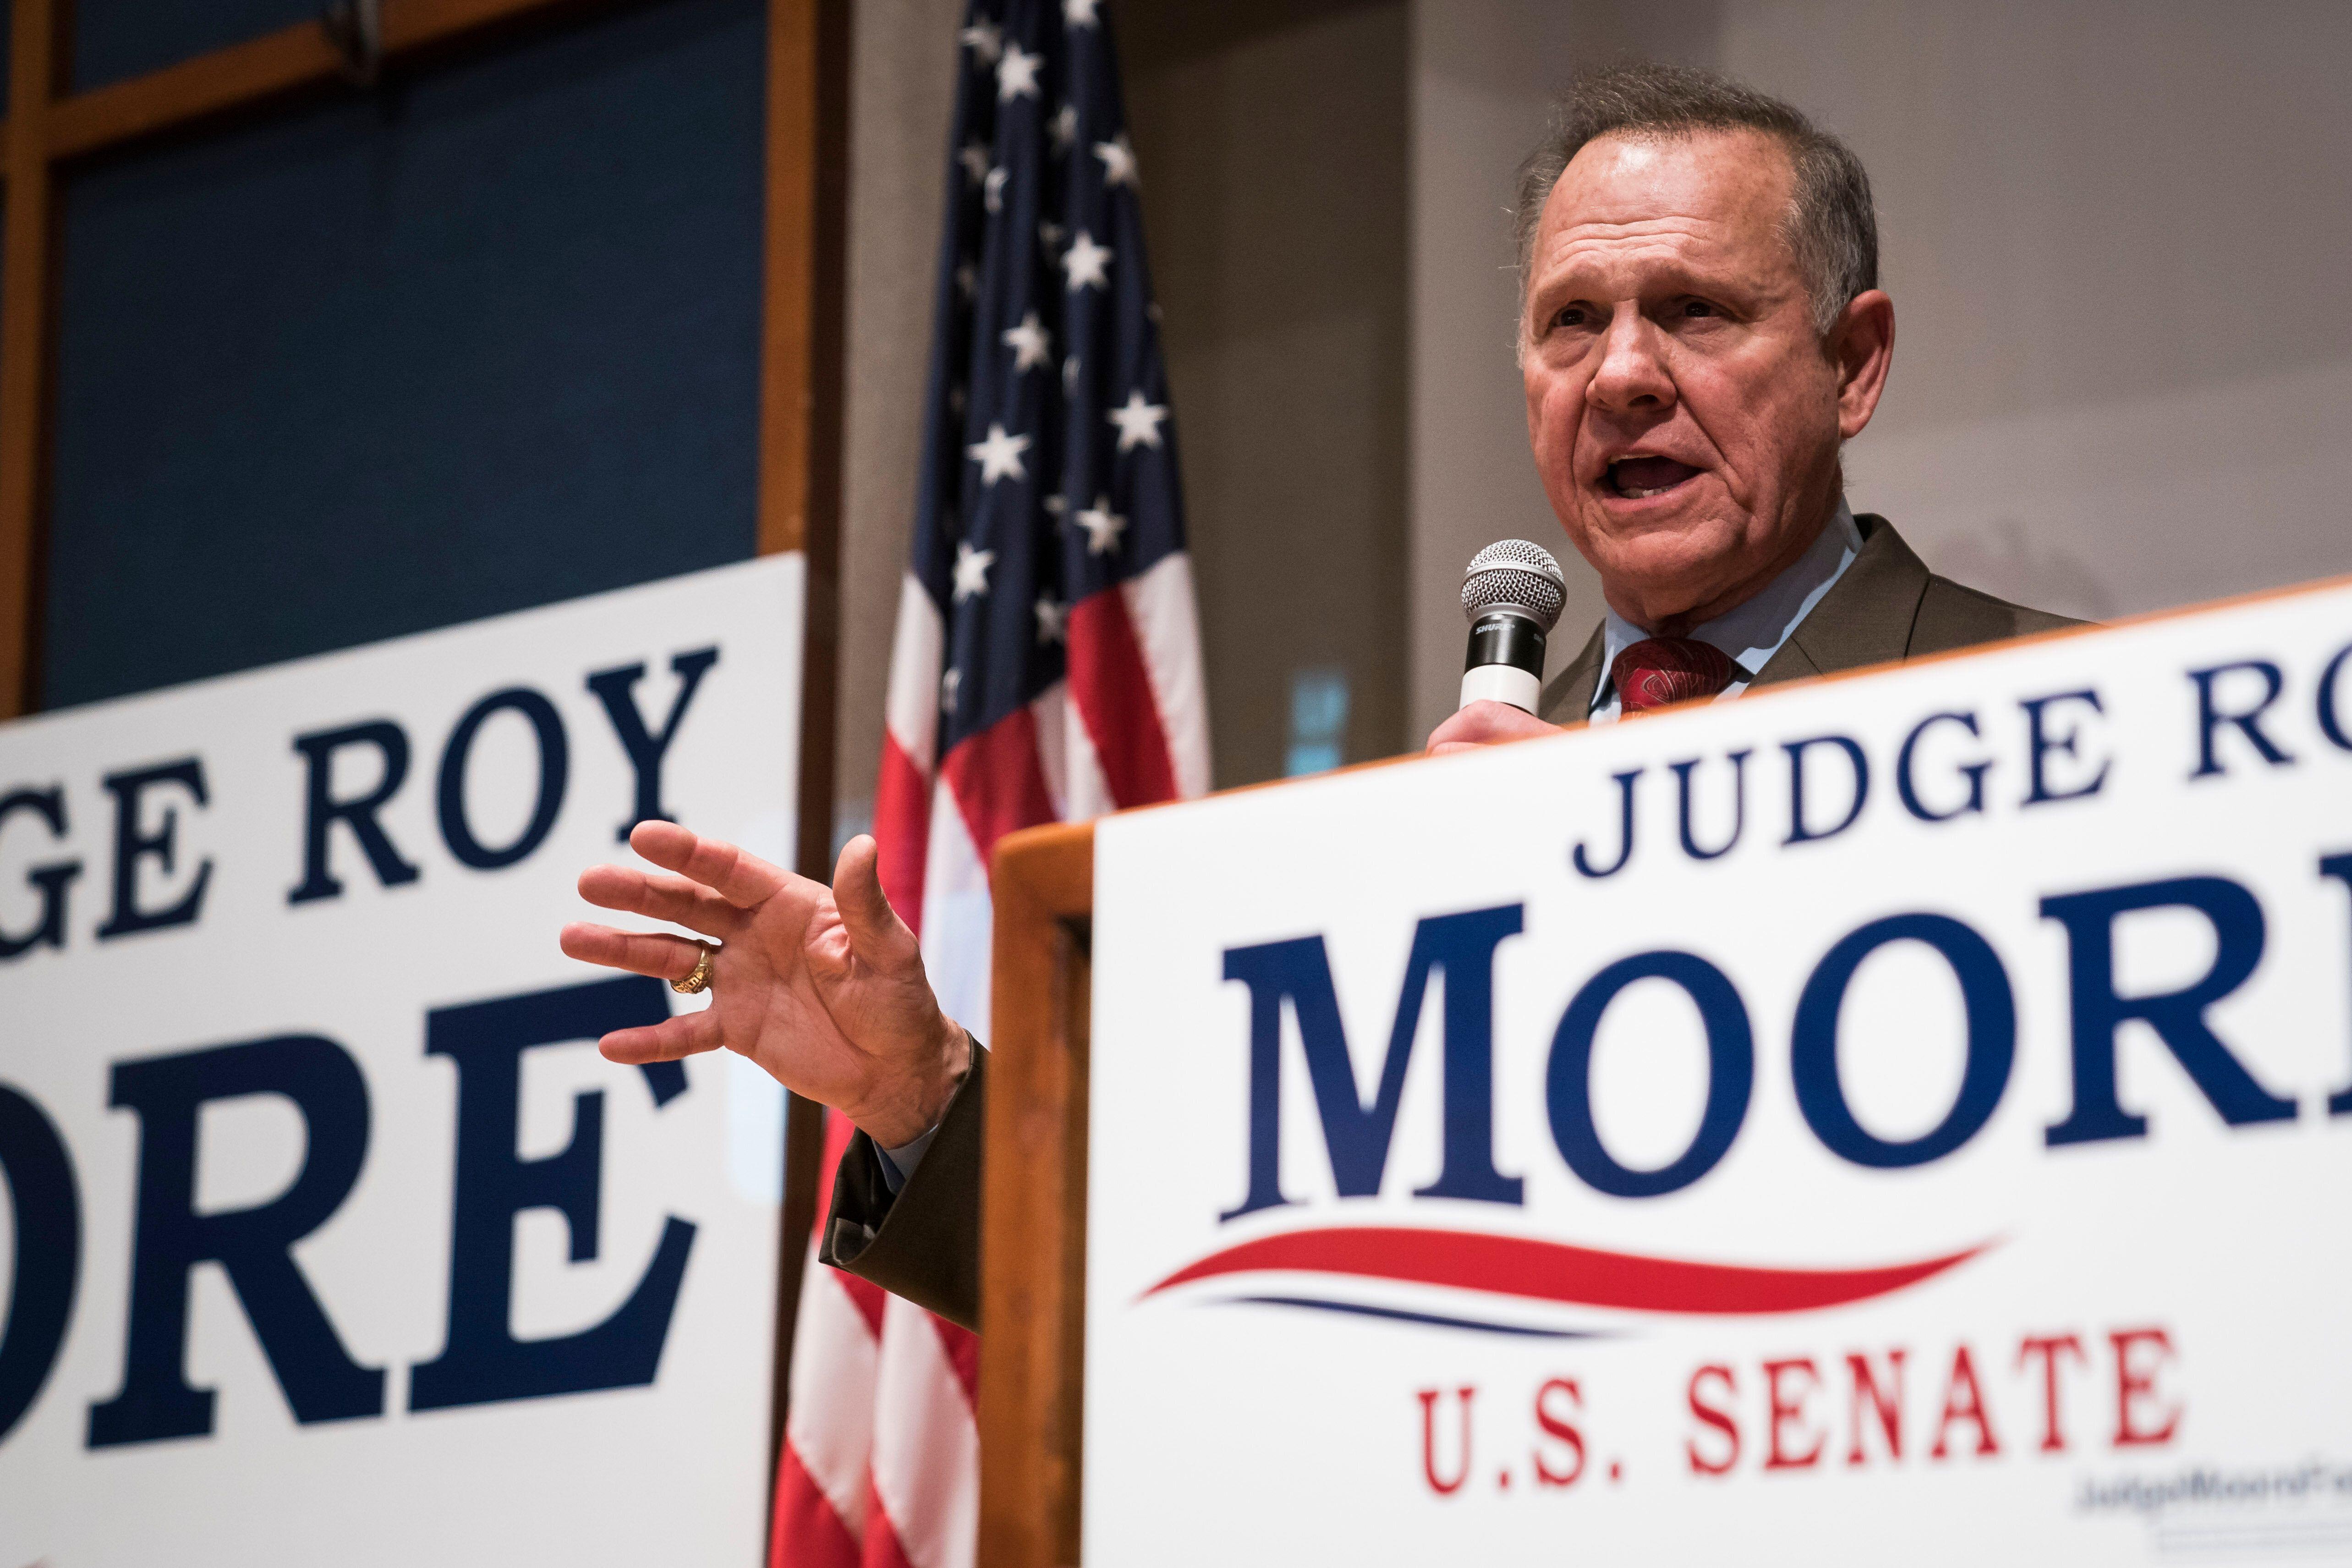 Former Alabama judge Roy Moore.